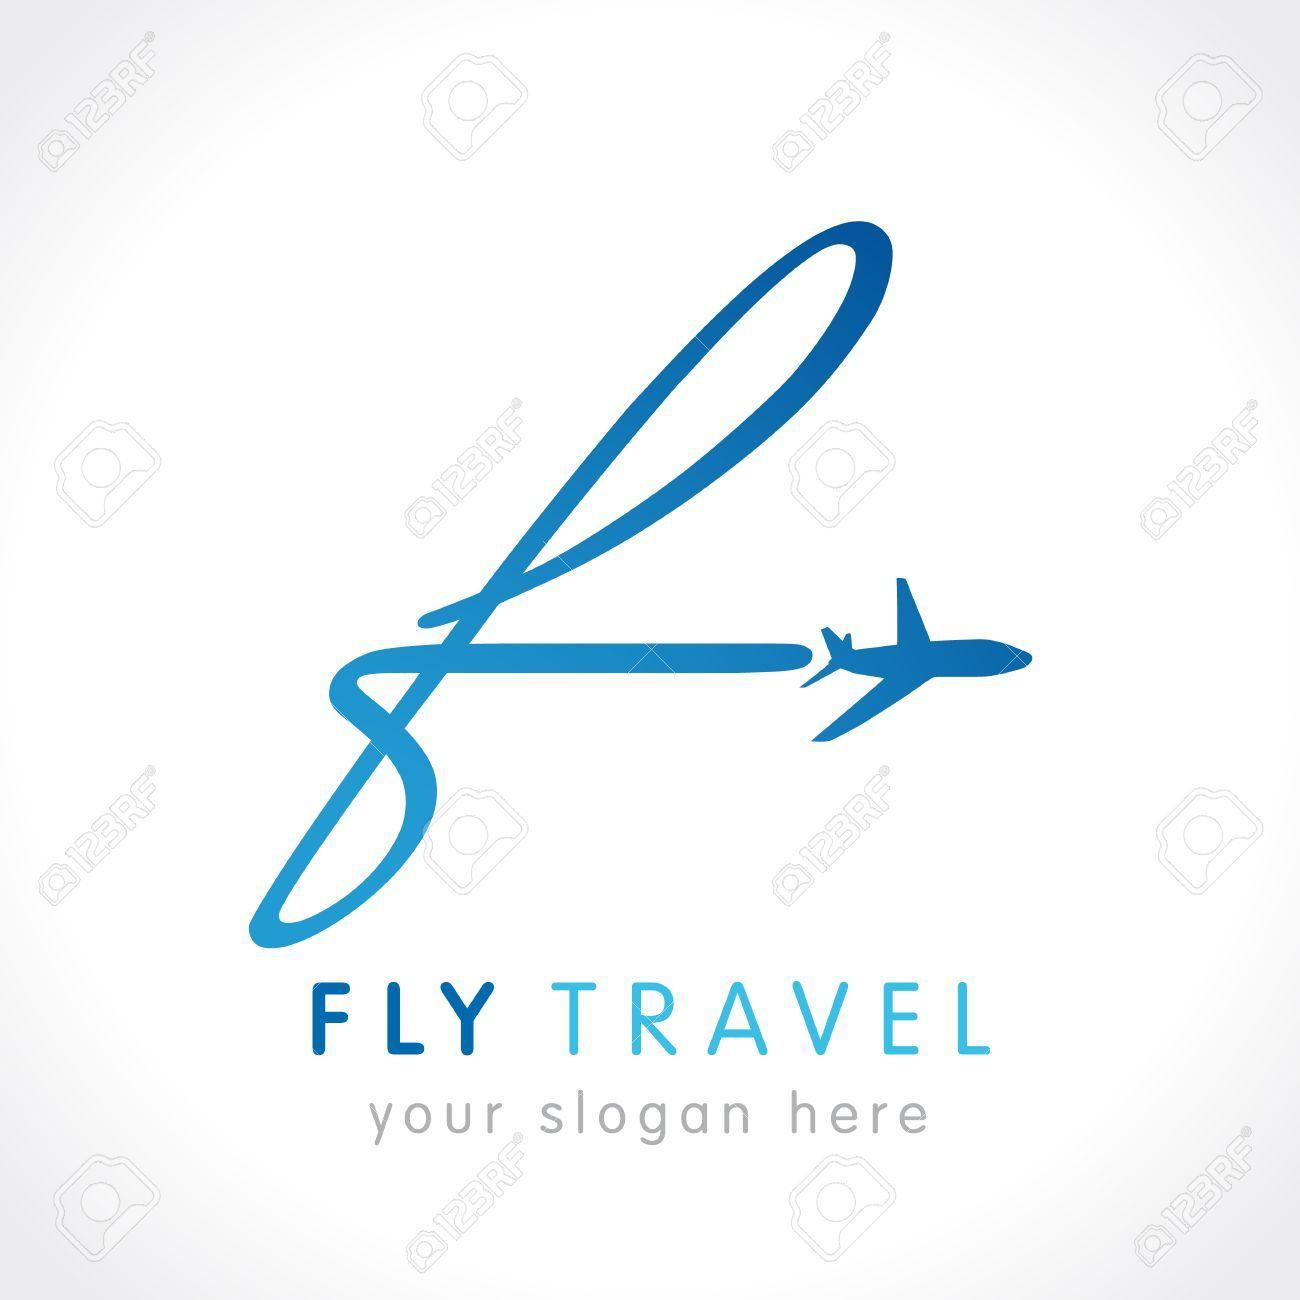 Logo Travel Pesquisa Google Travel Logo Travel Companies Travel Slogans